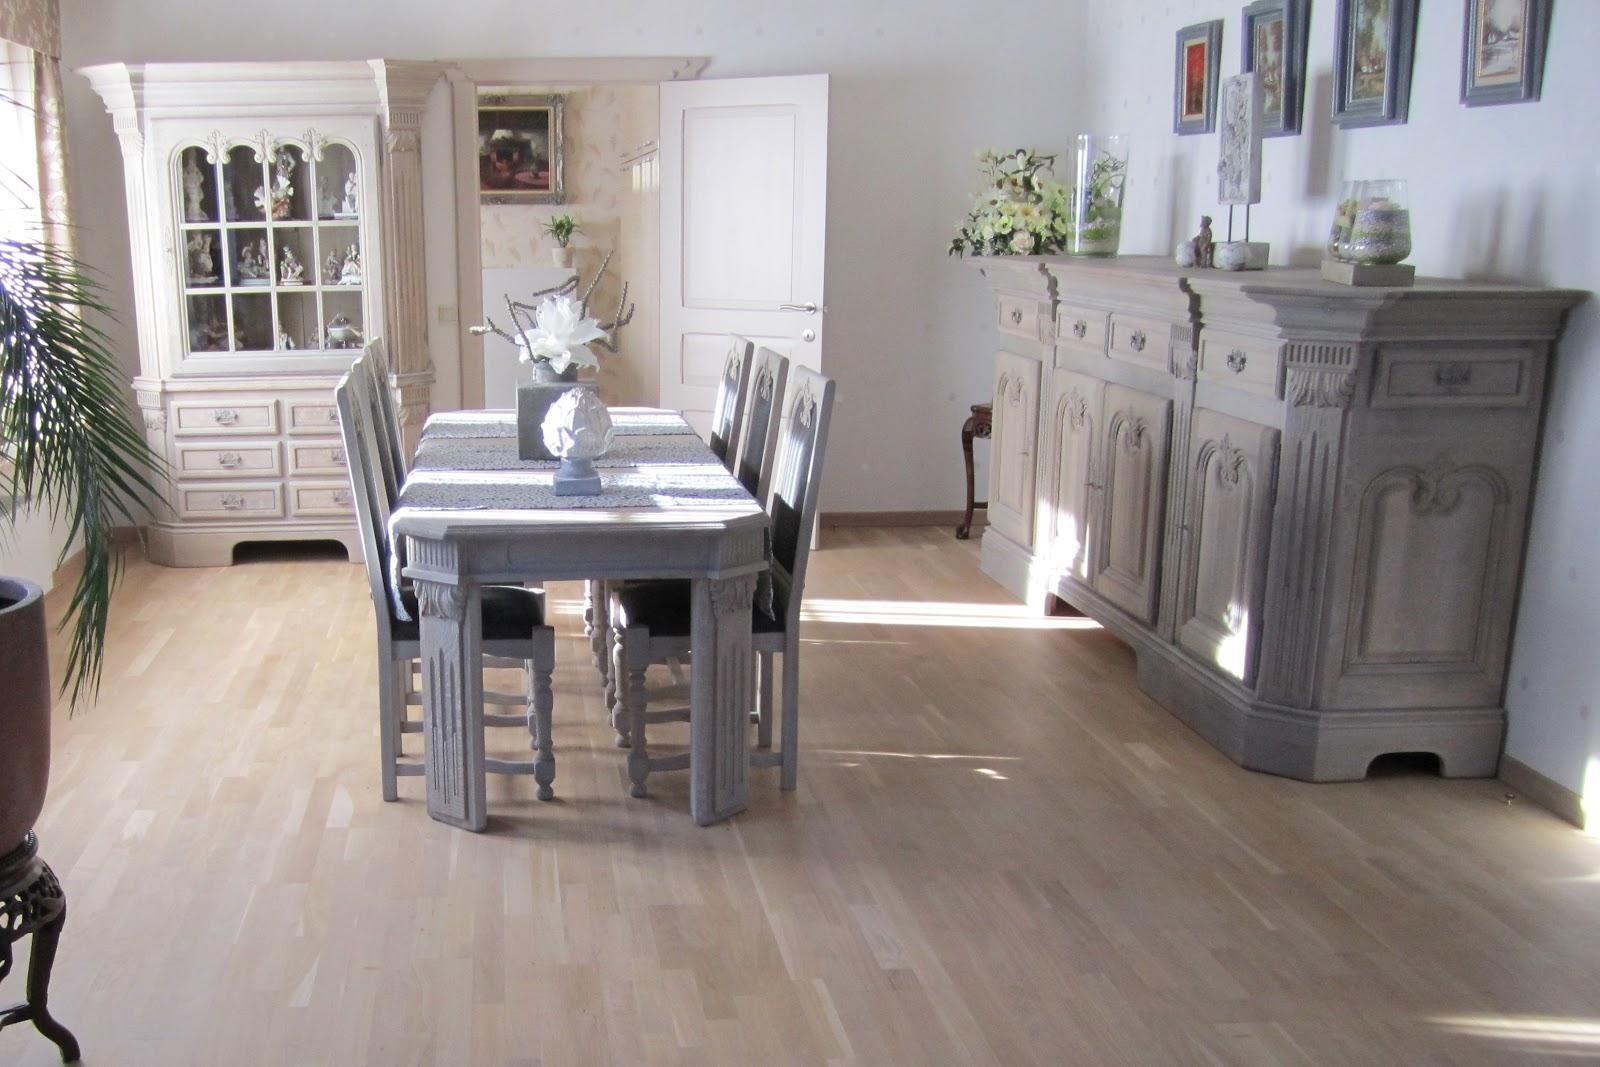 Oude Eiken Keuken Verven : Vernieuwen van eiken dressoir, vitrine, tafel en stoelen